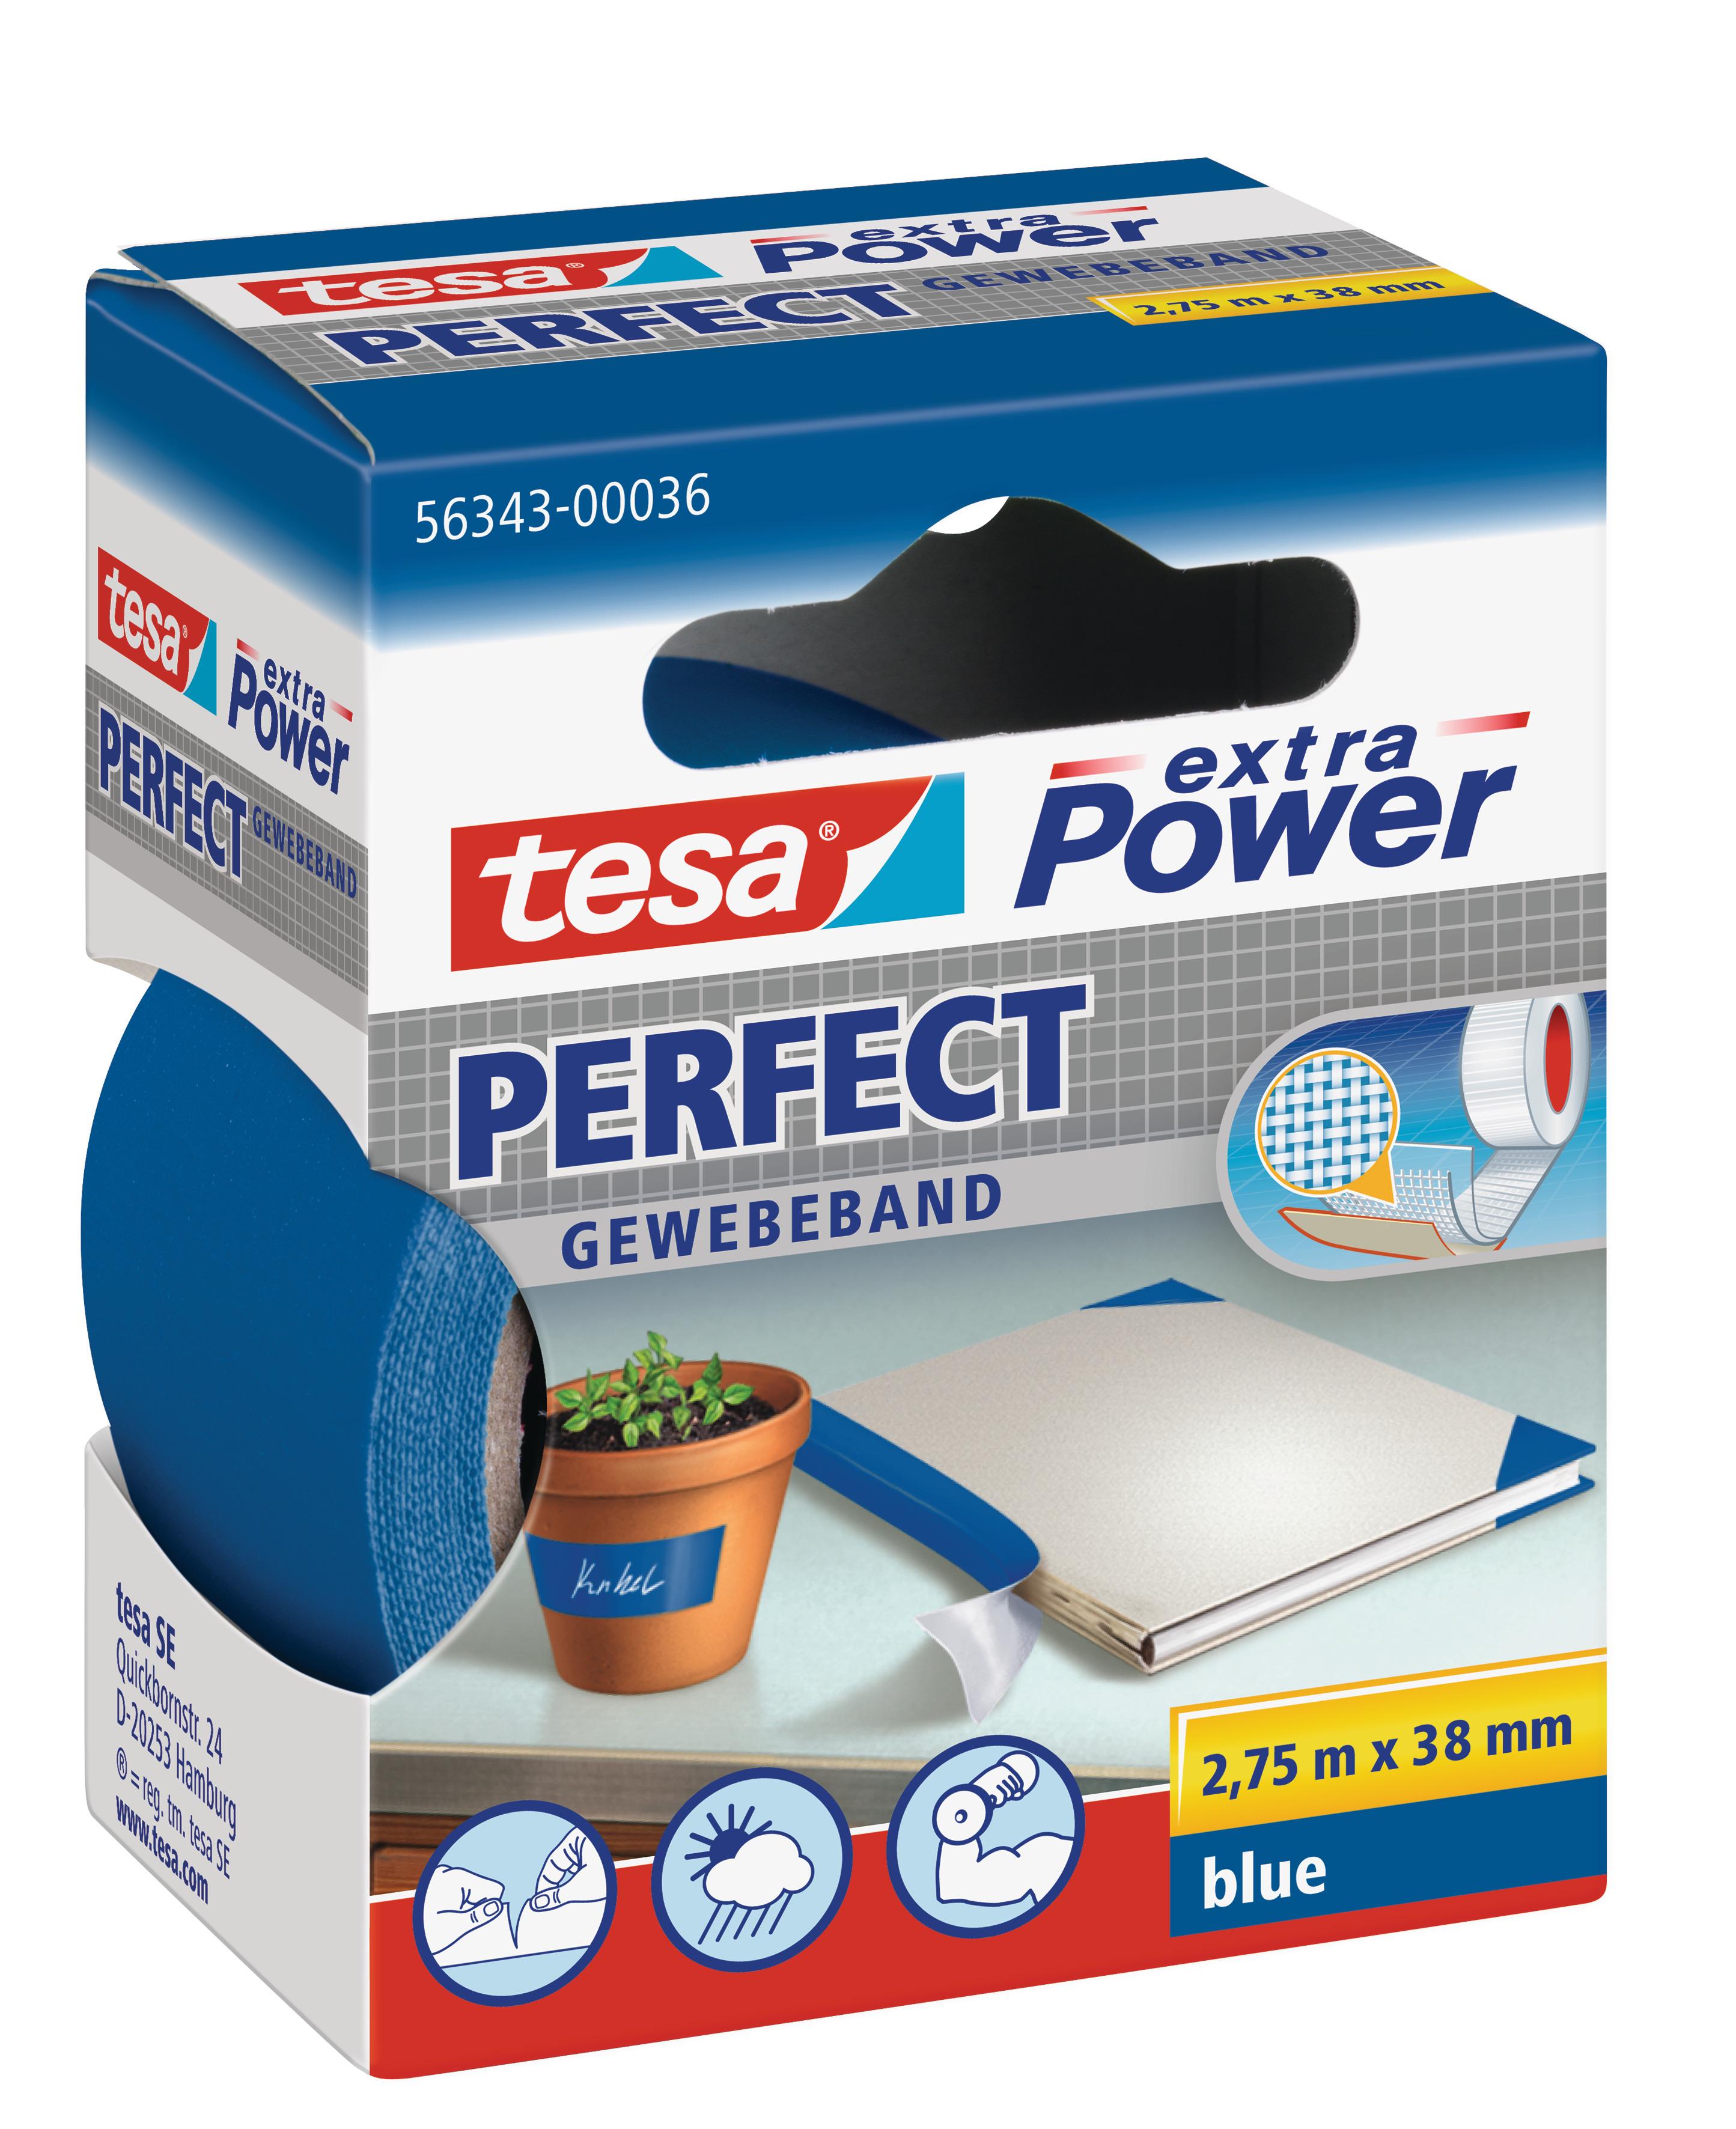 Vorschau: GP: 1,45 EUR/m tesa extra Power Perfect Gewebeband blau 2,75m x 38mm